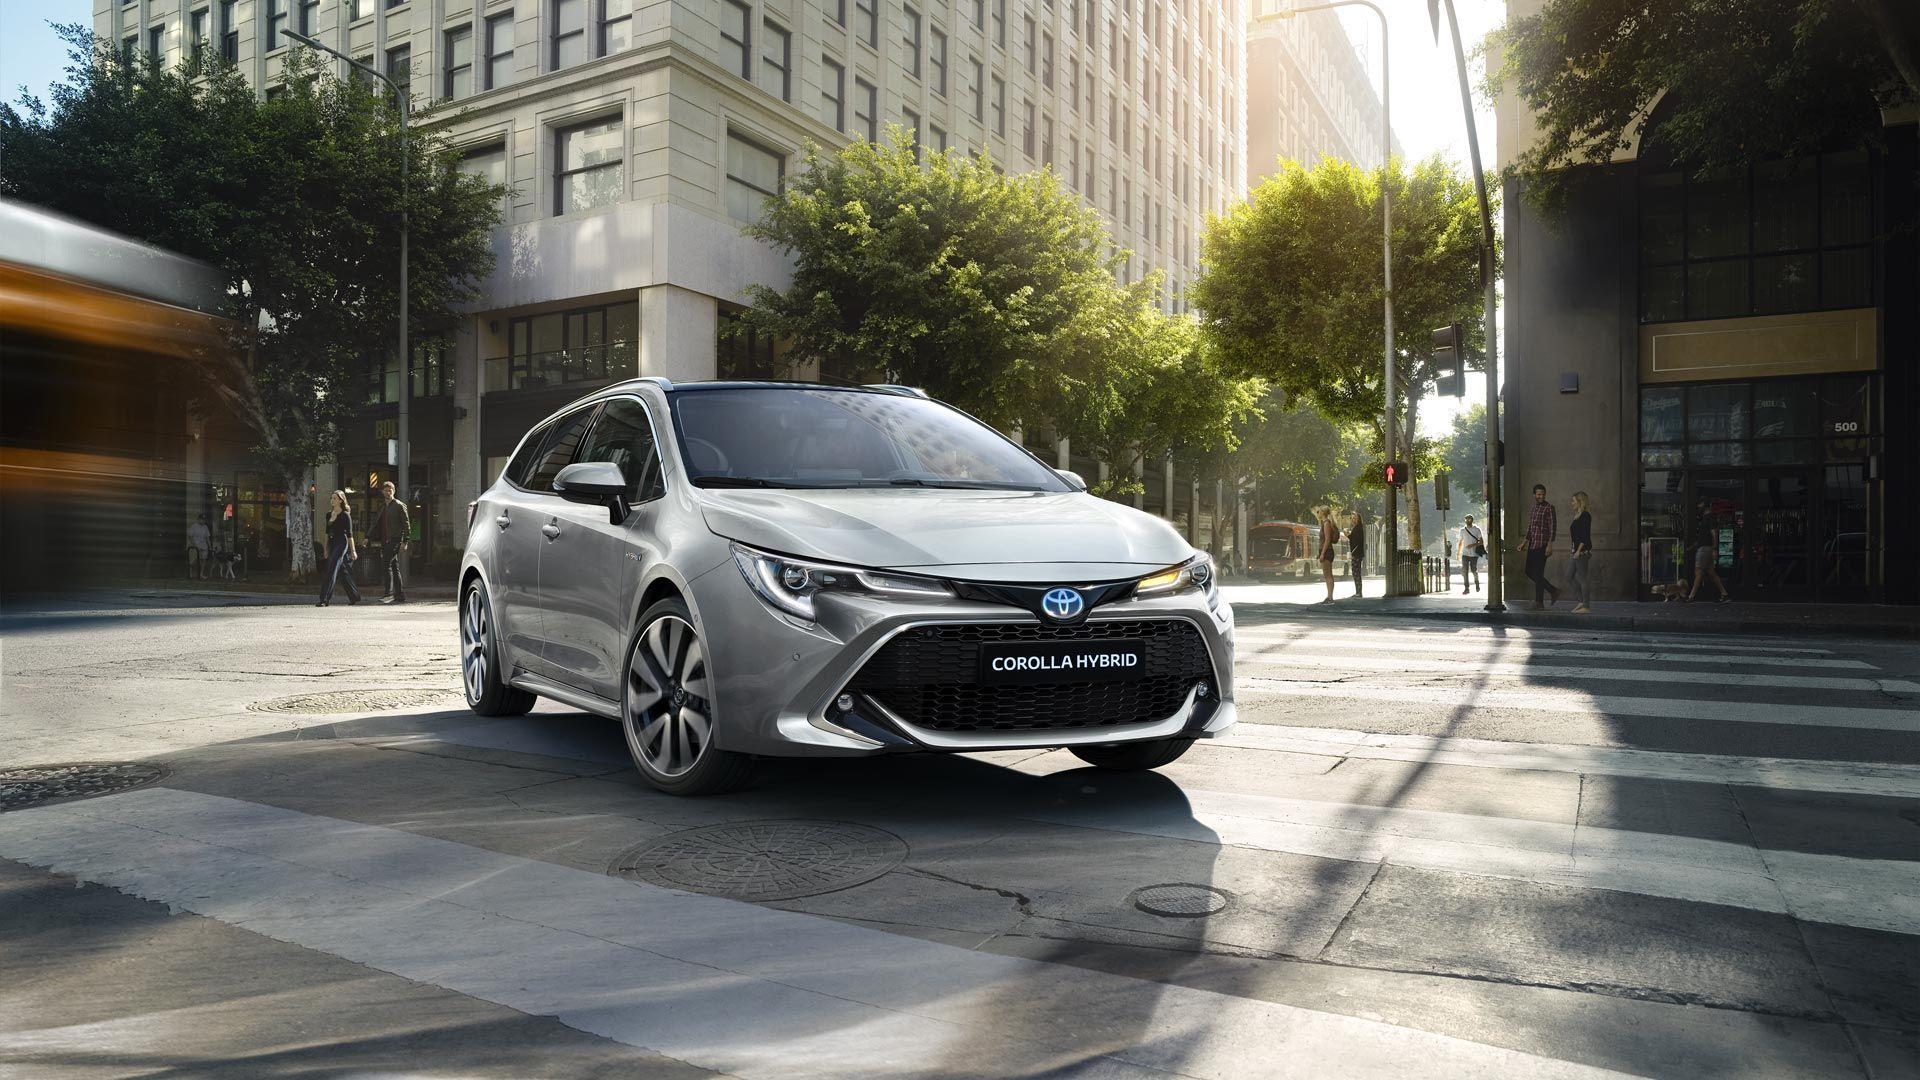 Nuevo Toyota Corolla Touring Sports 2019 en Galicia